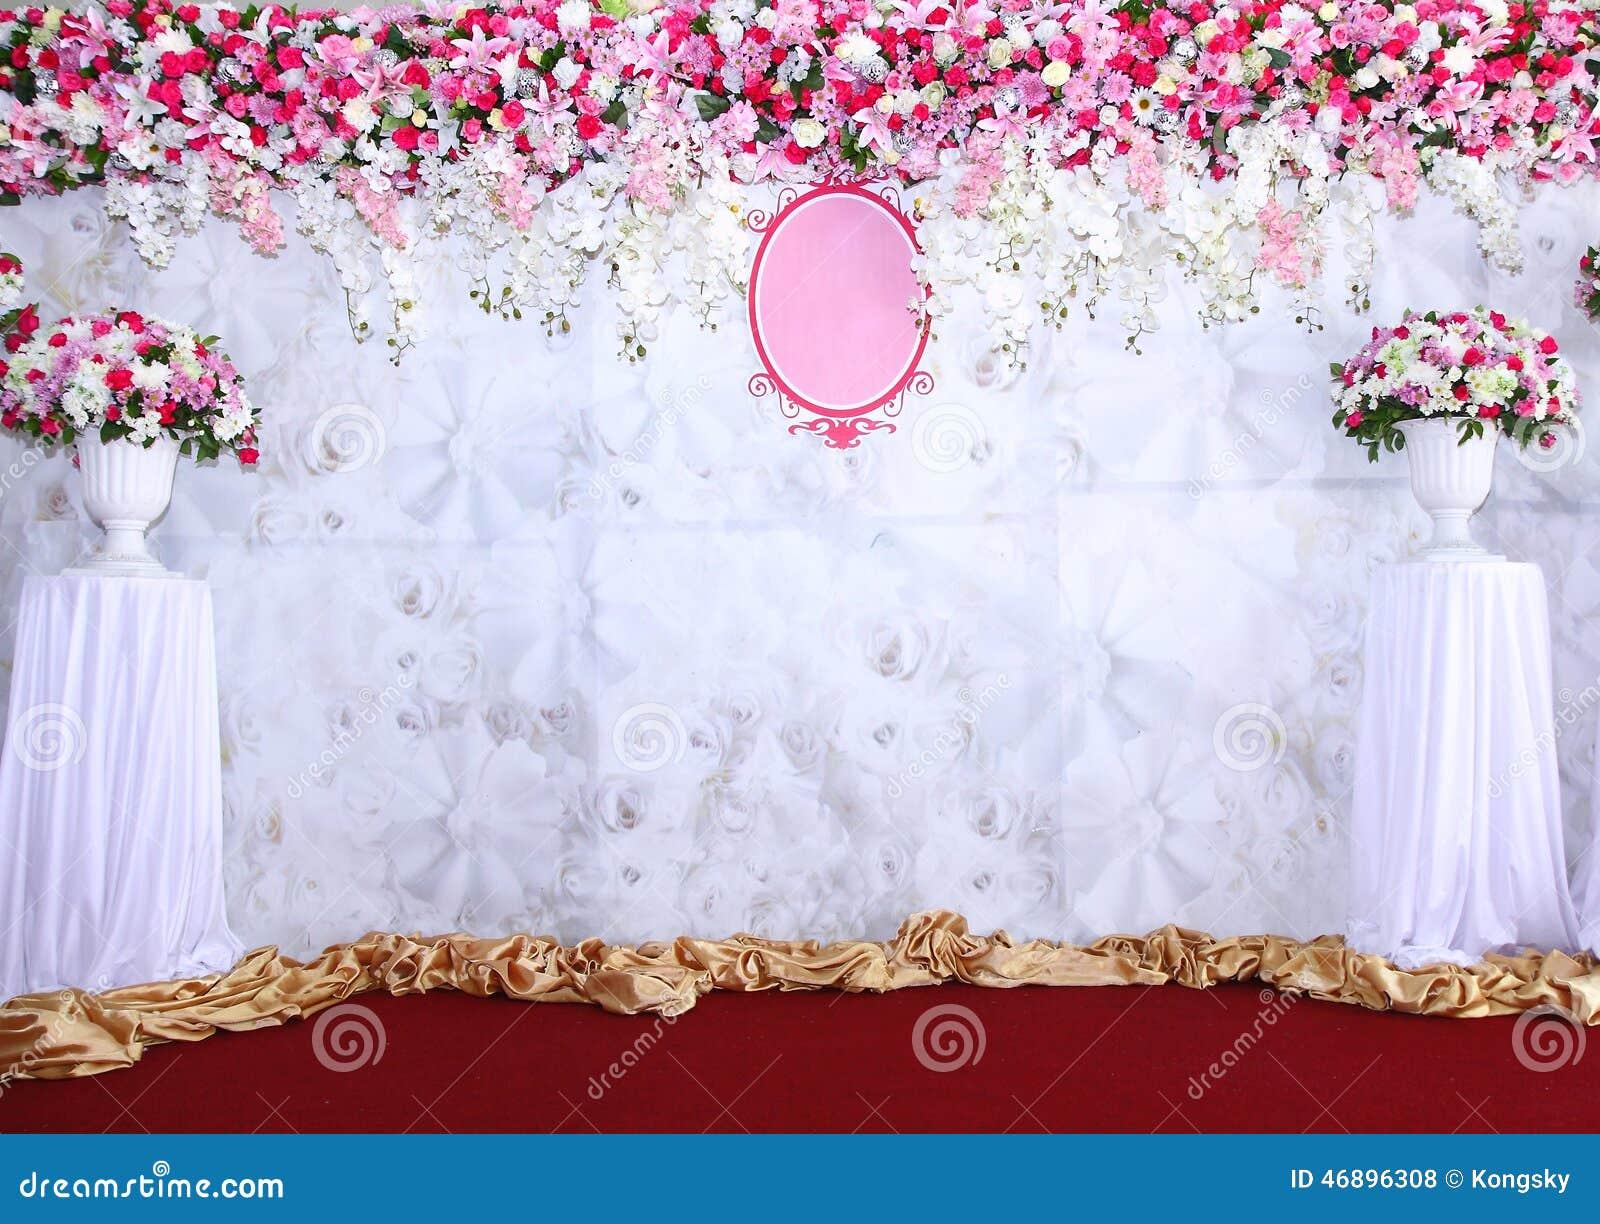 Баннер на свадьбу фон для фото